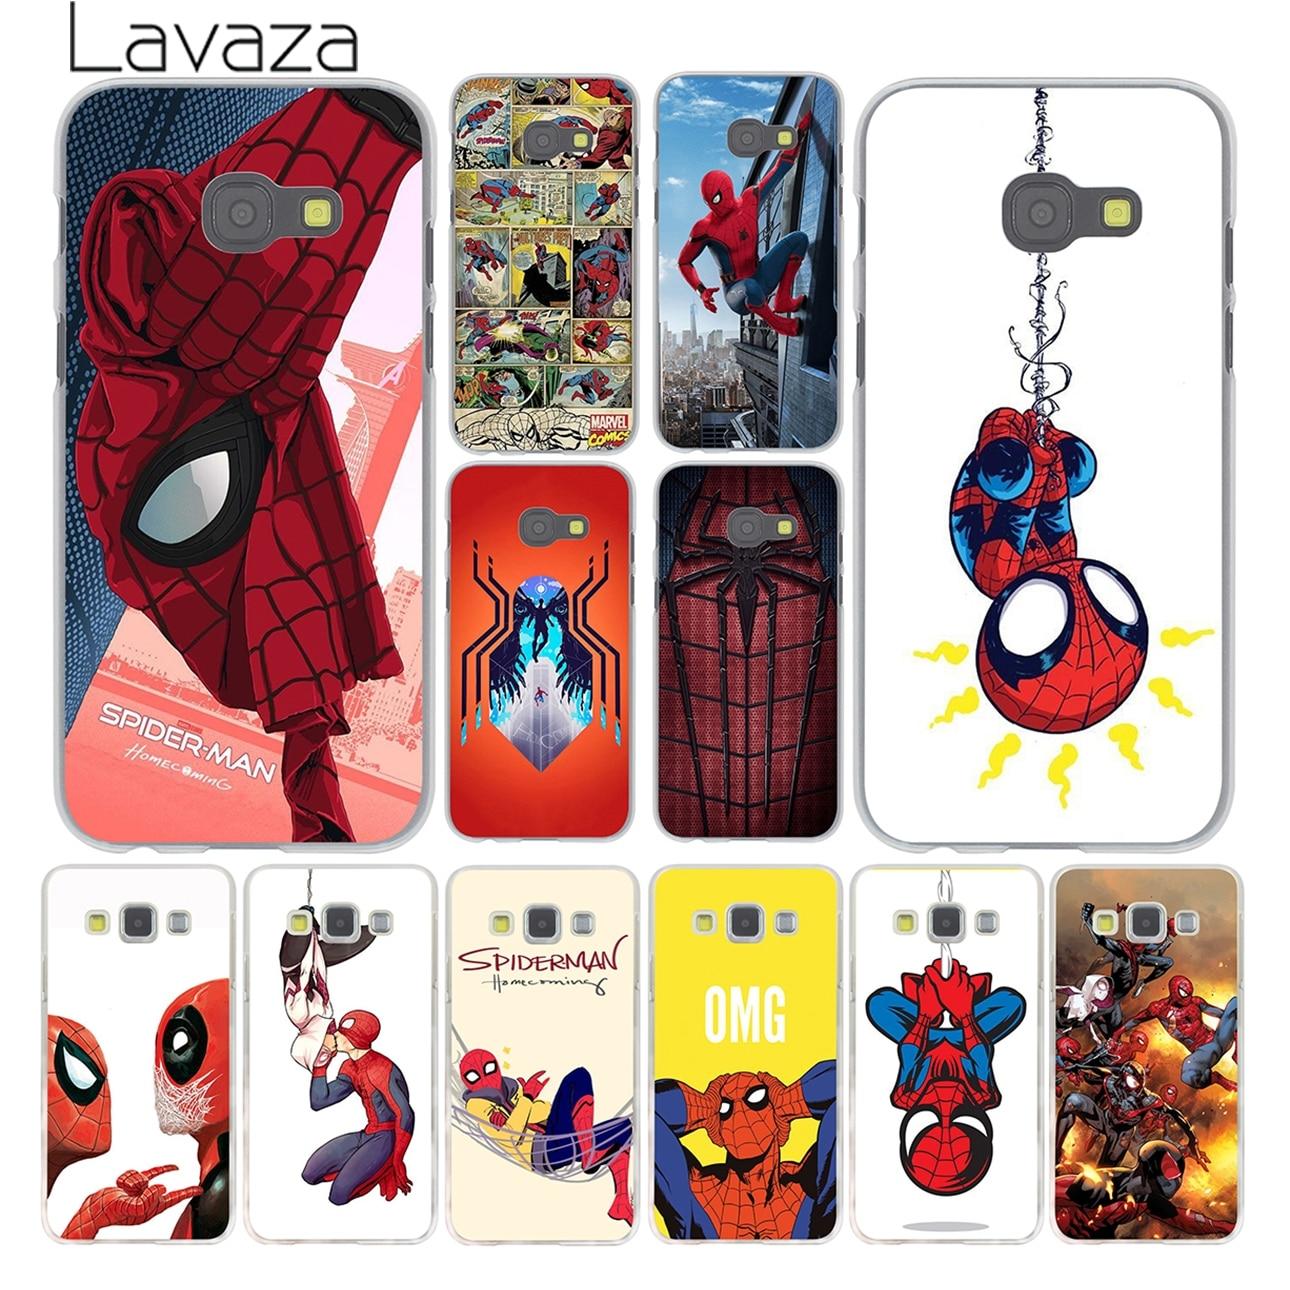 Lavaza Marvel <font><b>Spider</b></font>-<font><b>Man</b></font> <font><b>Spider</b></font> <font><b>Man</b></font> <font><b>Comics</b></font> Case for <font><b>Samsung</b></font> <font><b>Galaxy</b></font> A3 A5 J3 J5 J7 2015 2016 2017 & Grand Prime Note 5 4 3 2